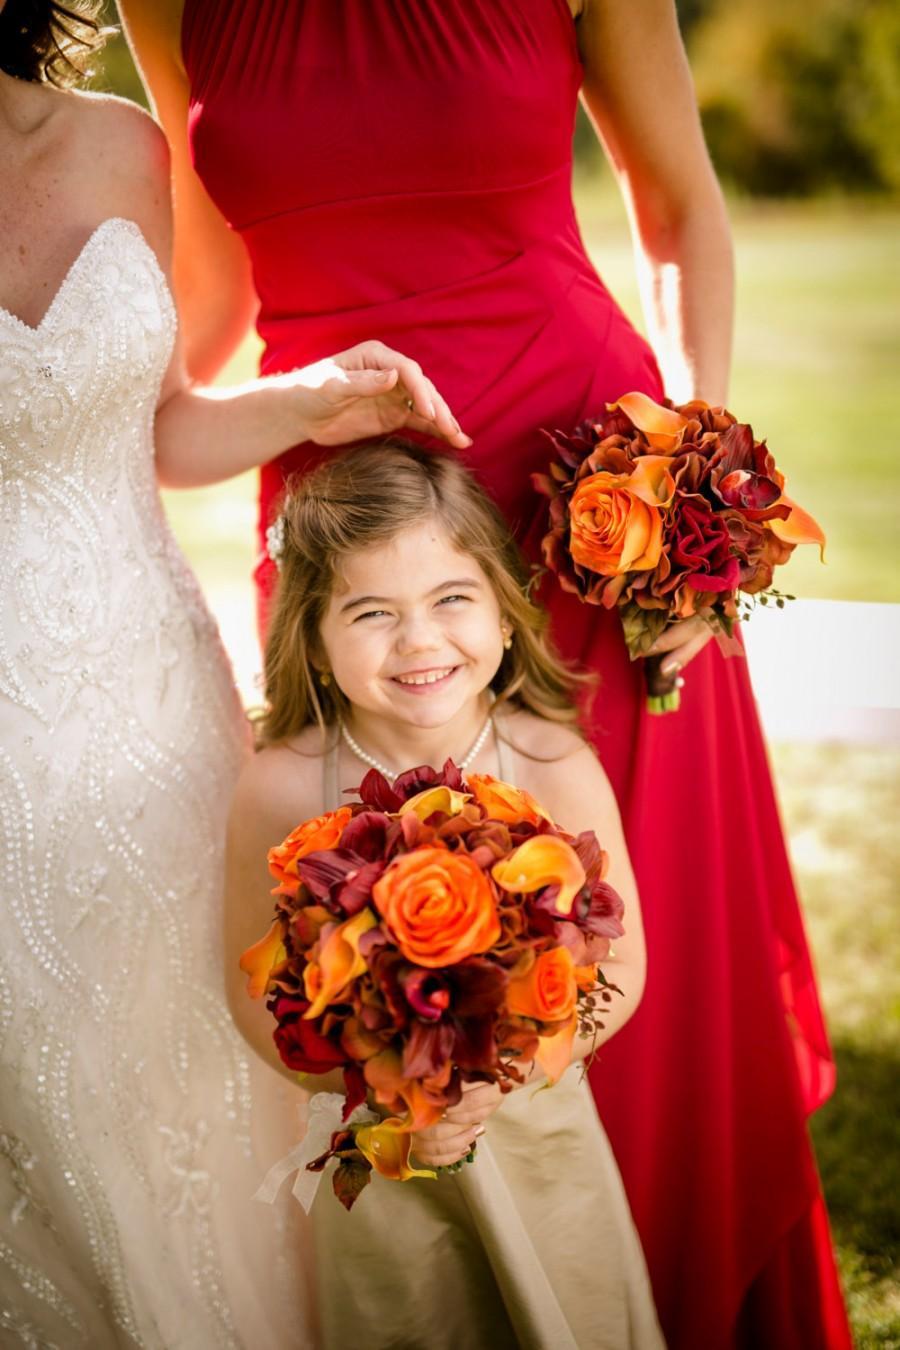 Свадьба - Autumn bouquet, Wedding bouquet - Fall bouquet, Bride bouquet - Red and orange silk wedding flowers